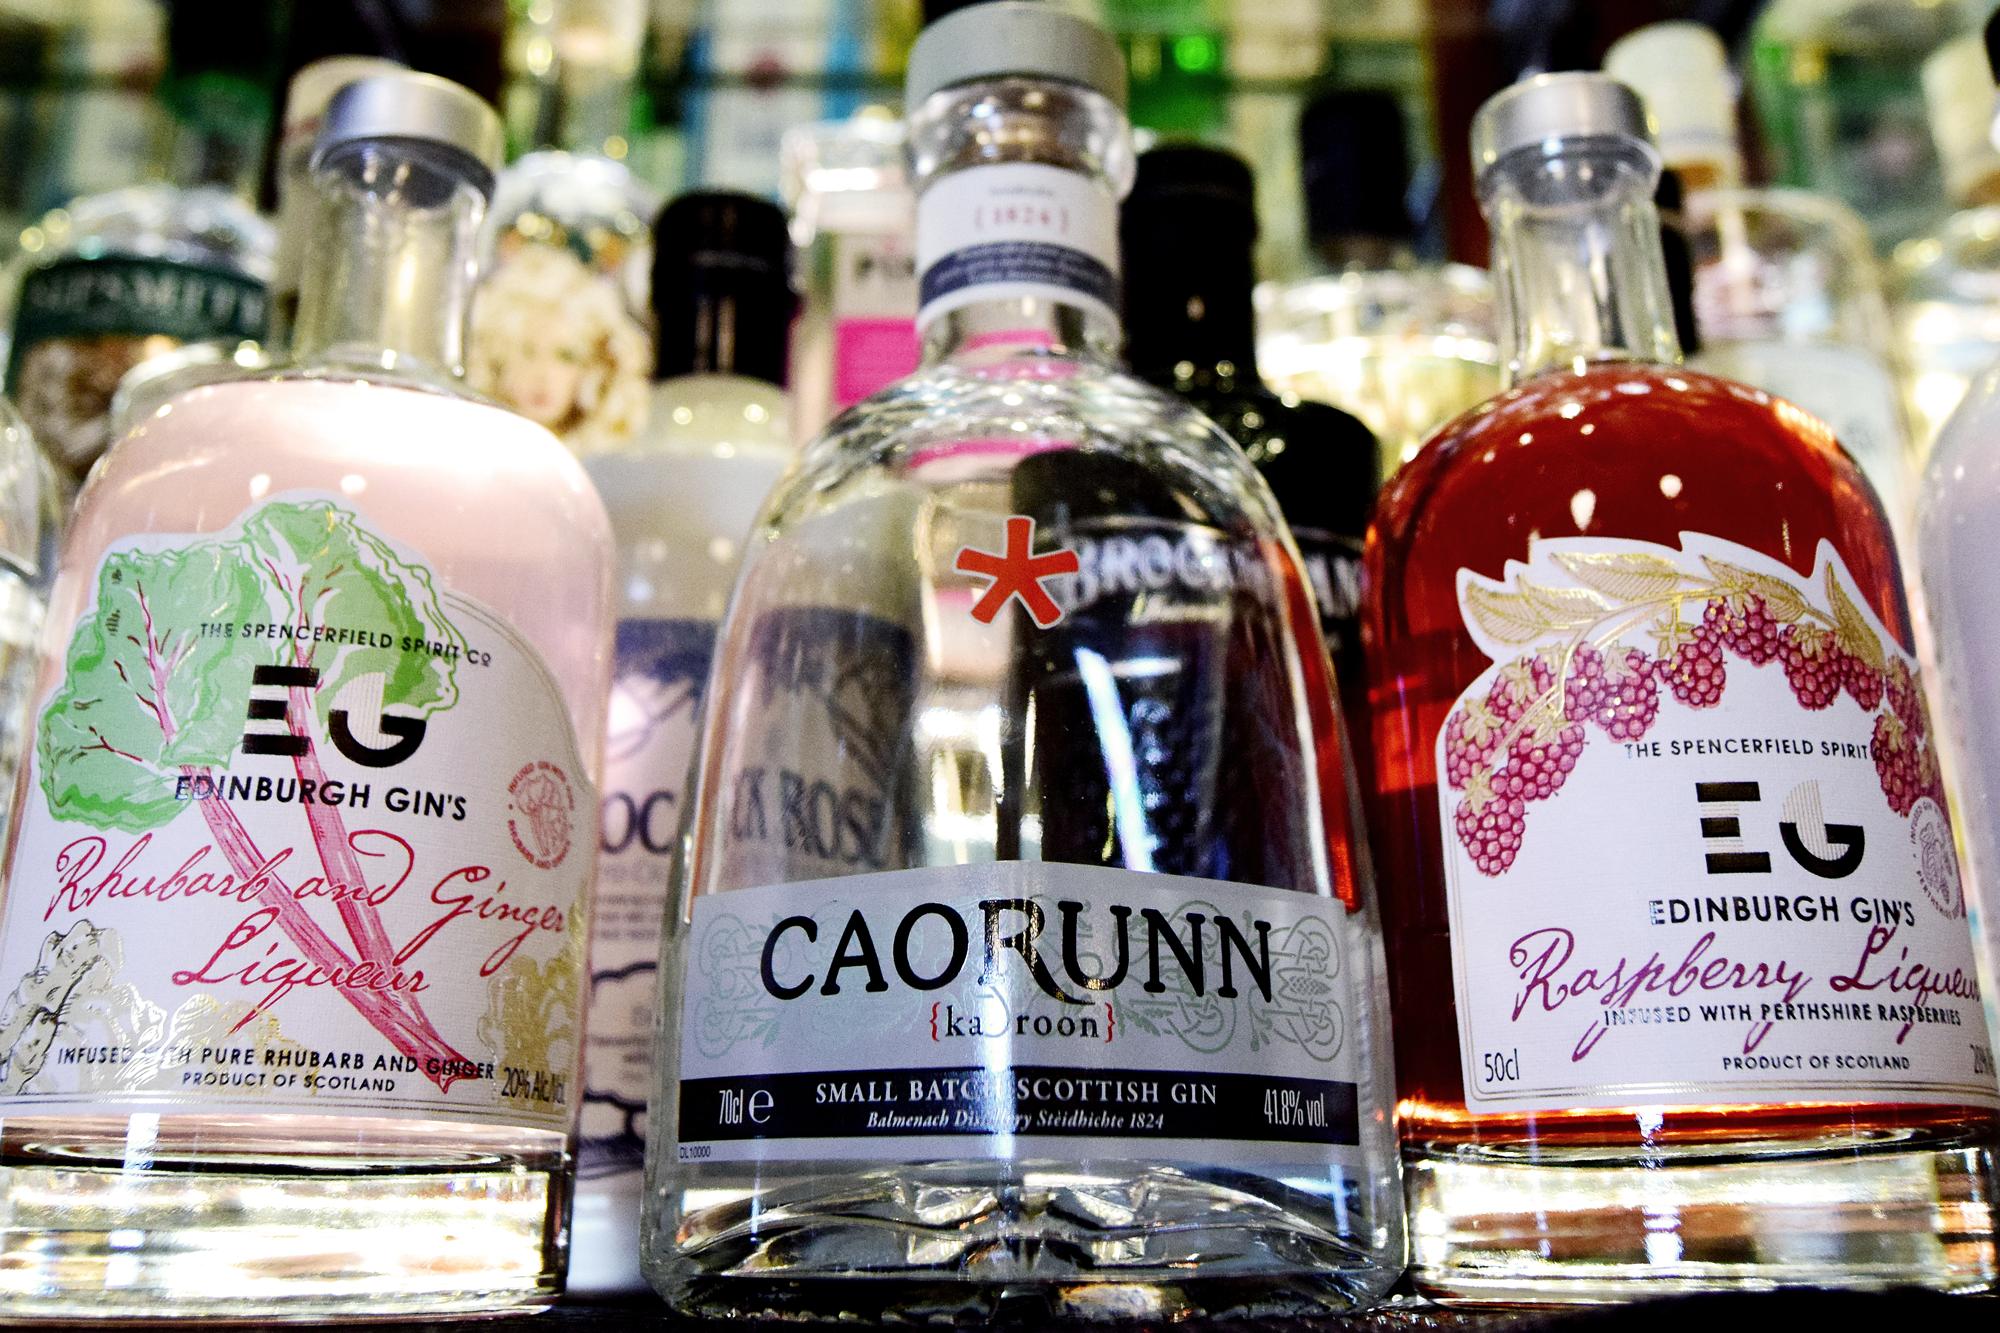 Heraghty's Bar Scottish Gin selectio